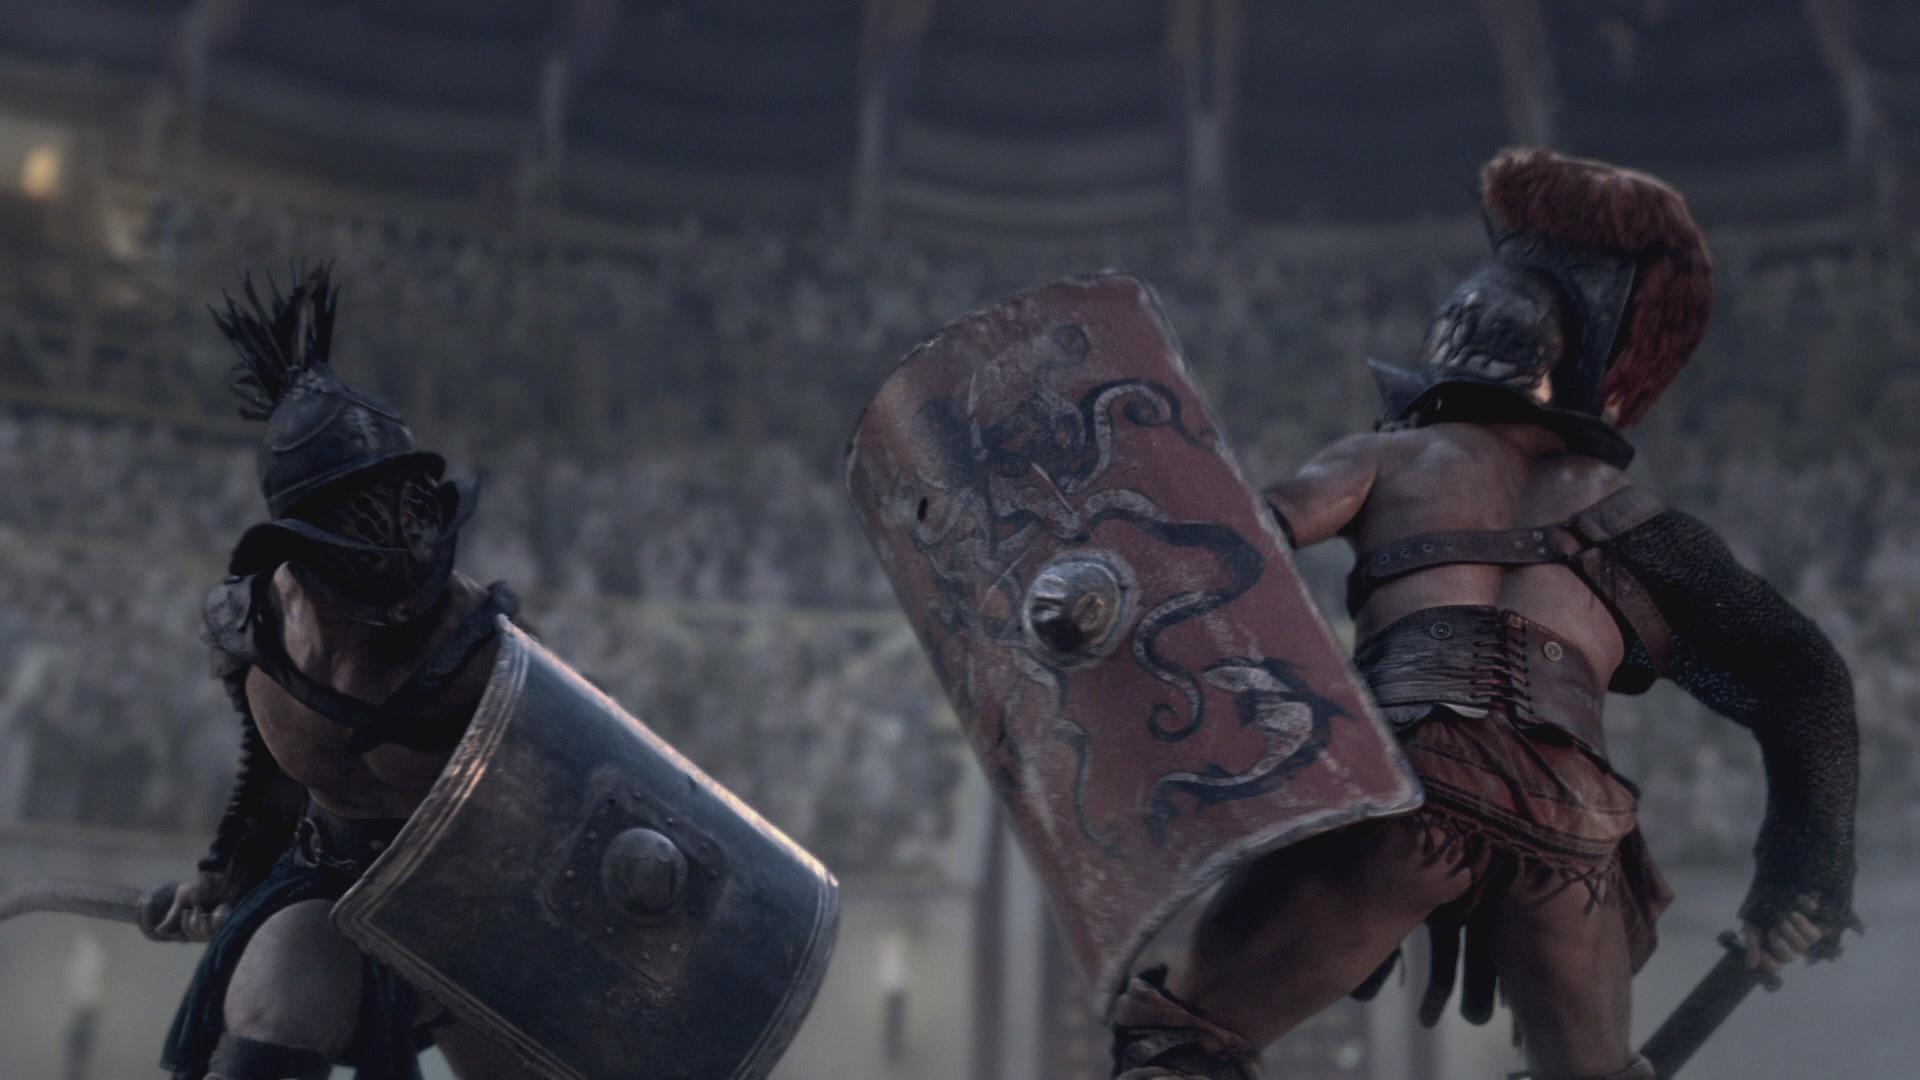 Gladiator vs history